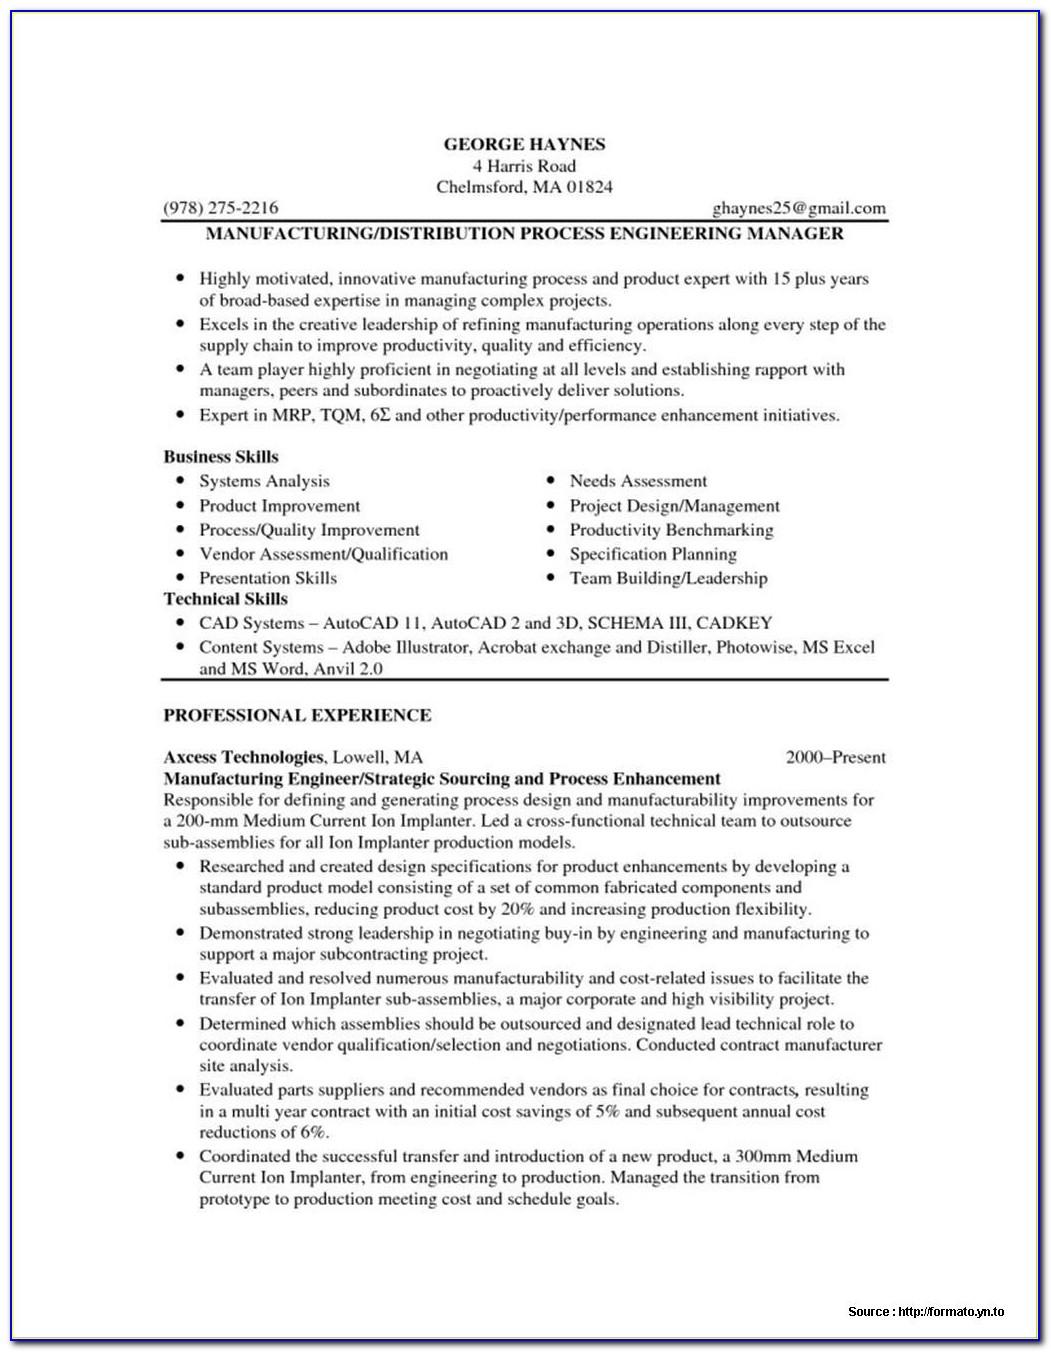 Resume Maker Free Download Windows 7